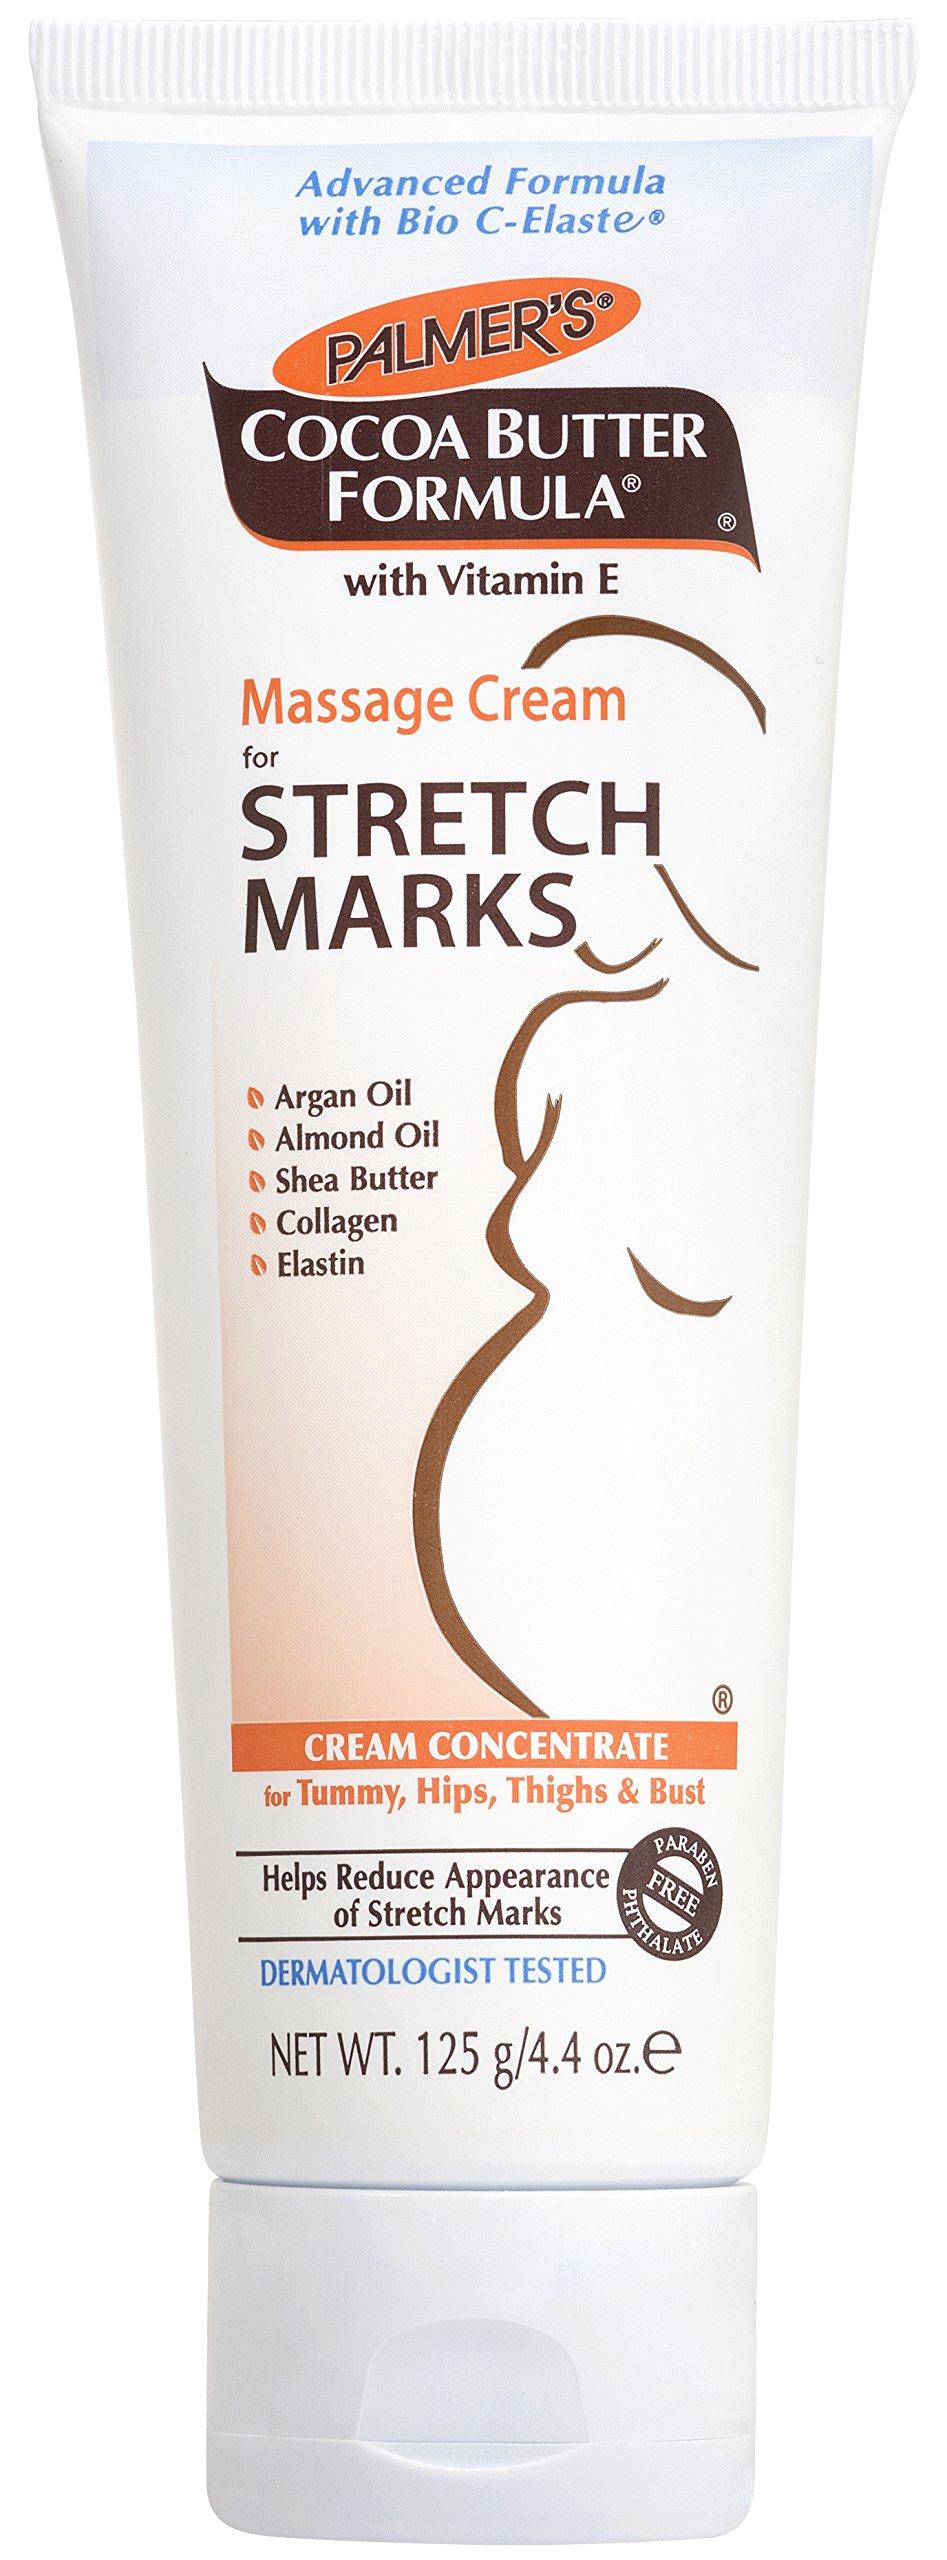 Palmer's Cocoa Butter Formula Massage Cream for Stretch Marks, 4.4 Oz